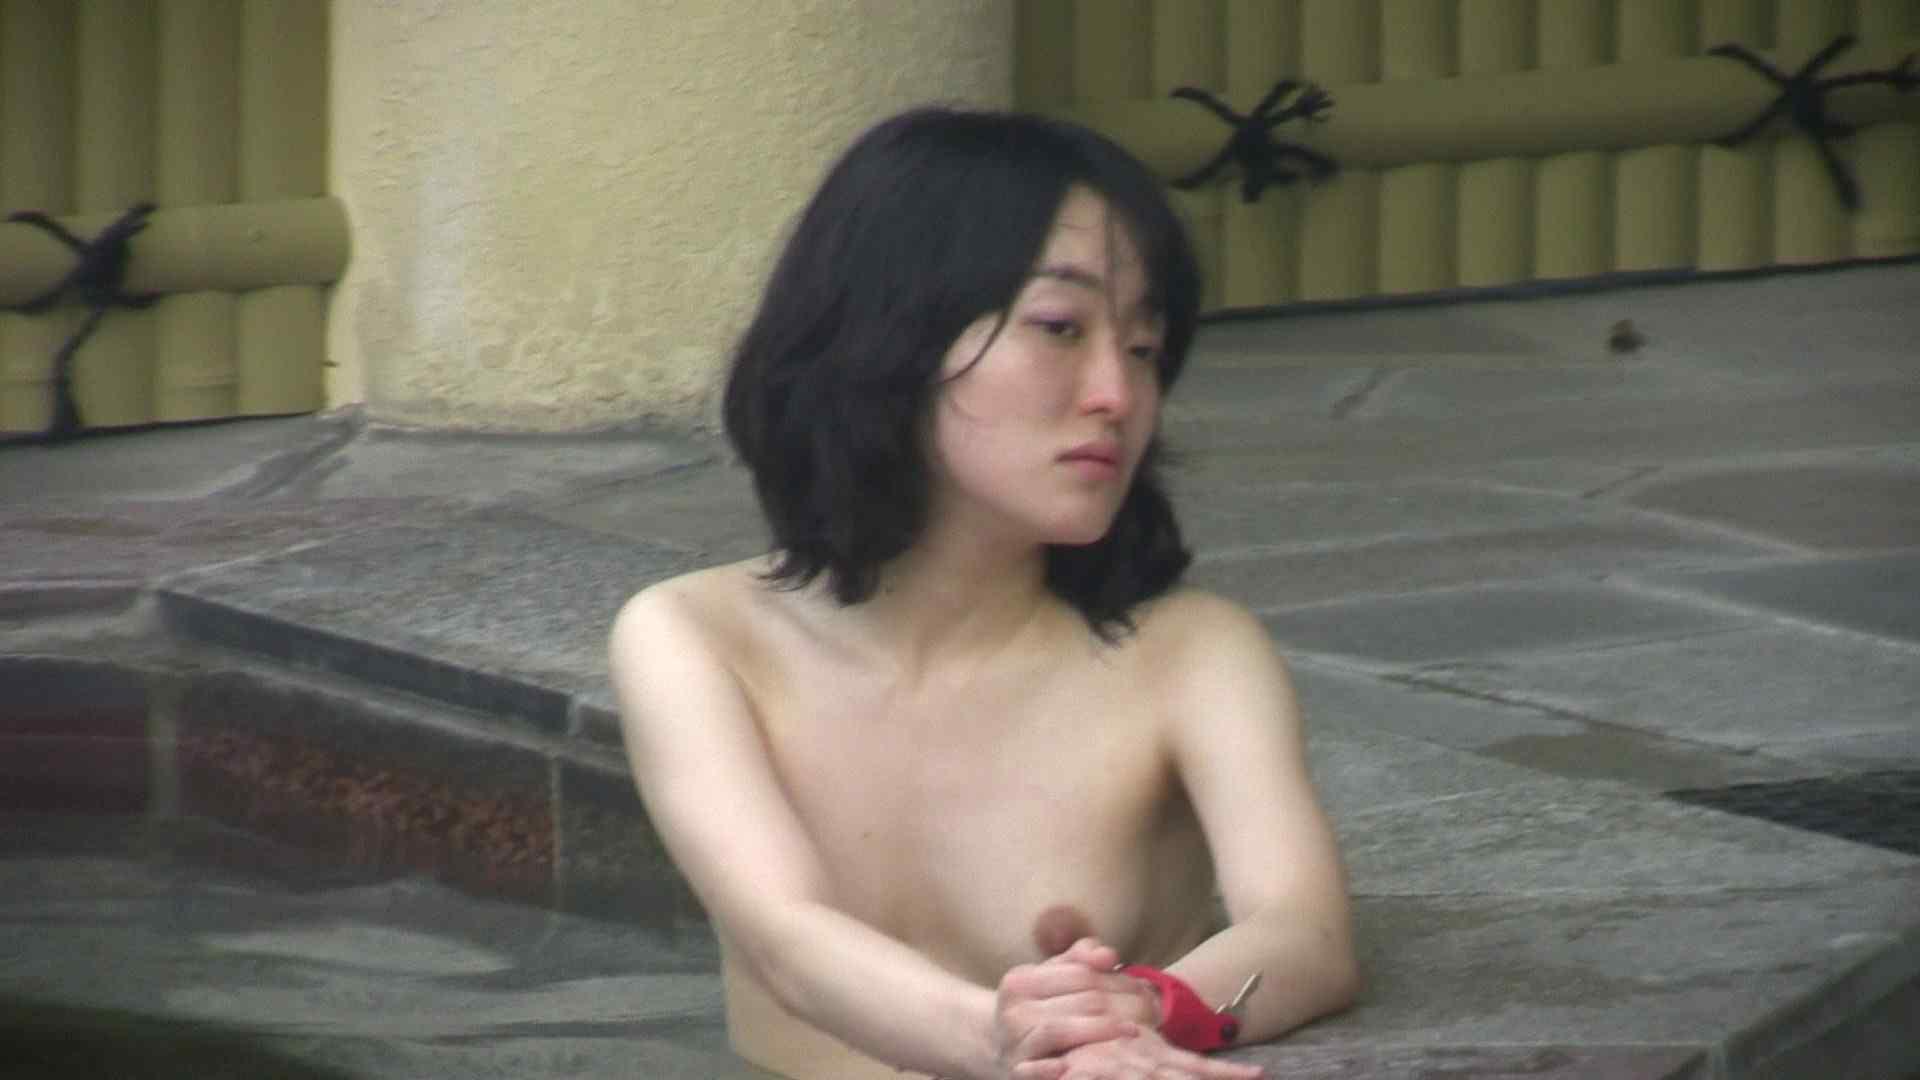 Aquaな露天風呂Vol.681 盗撮シリーズ   露天風呂編  94PIX 57